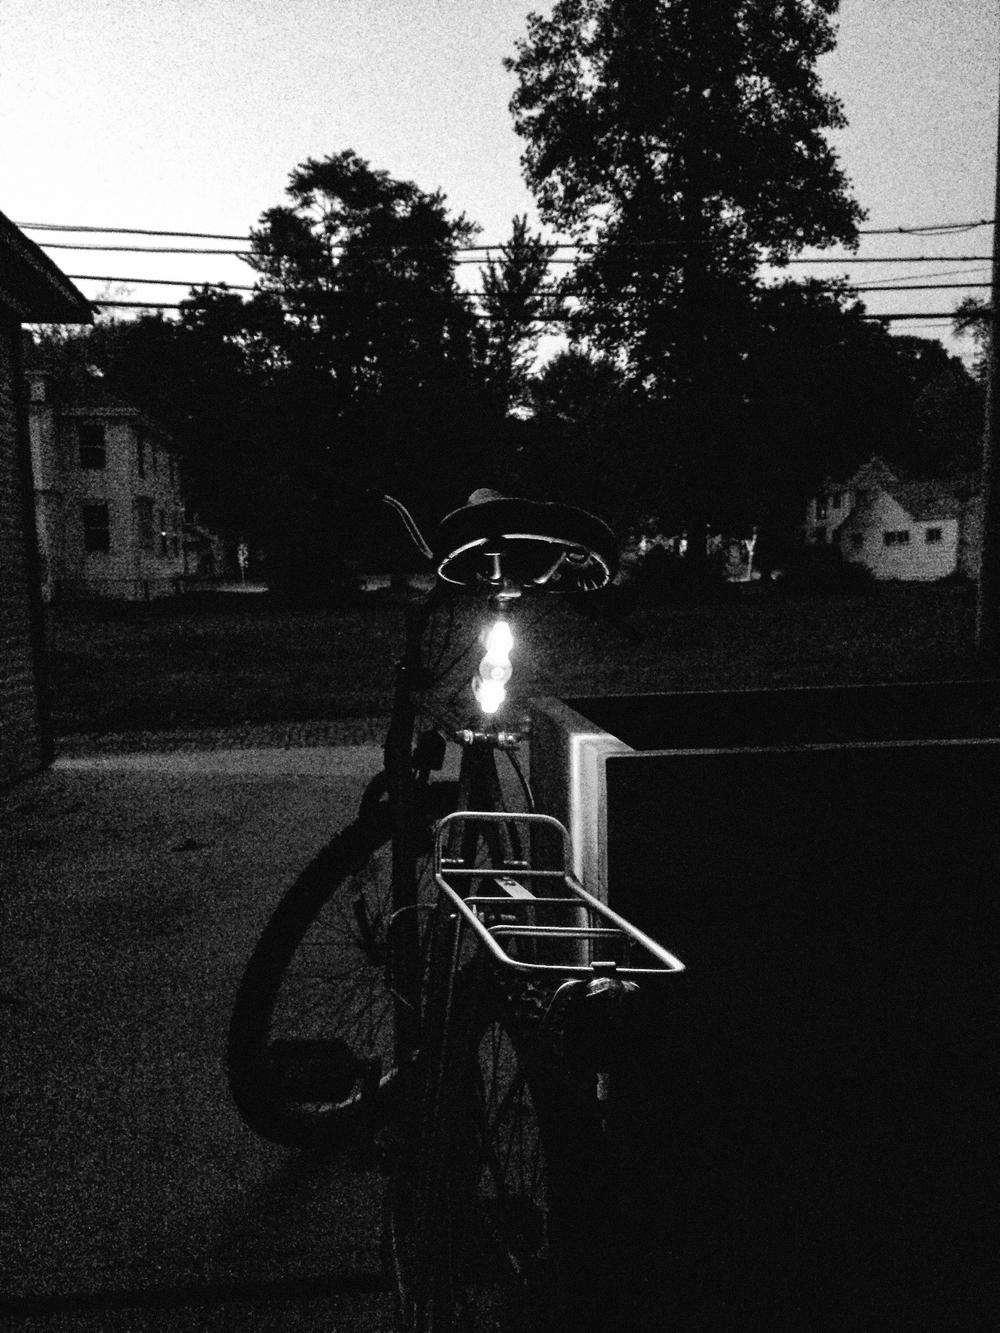 NightMovesRace1-2.jpg